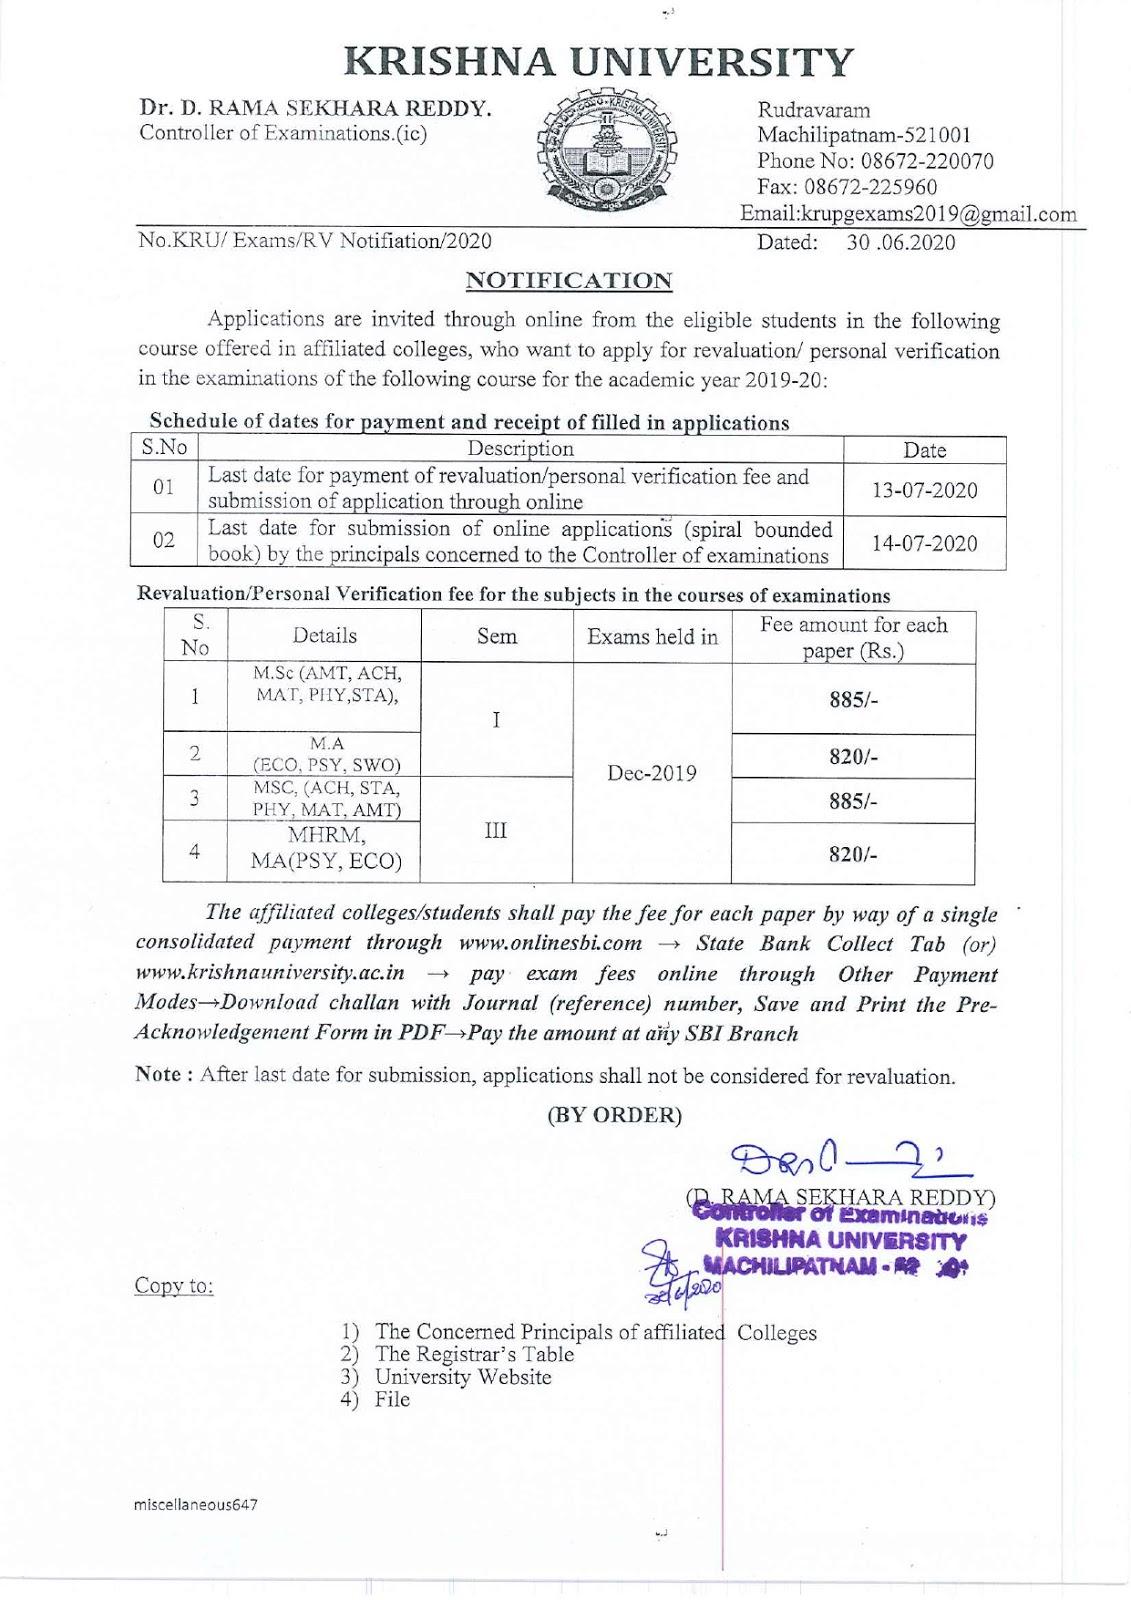 Krishna University PG 1st & 3rd Sem Phase-III Dec 2019 Revaluation Fee Notfiication